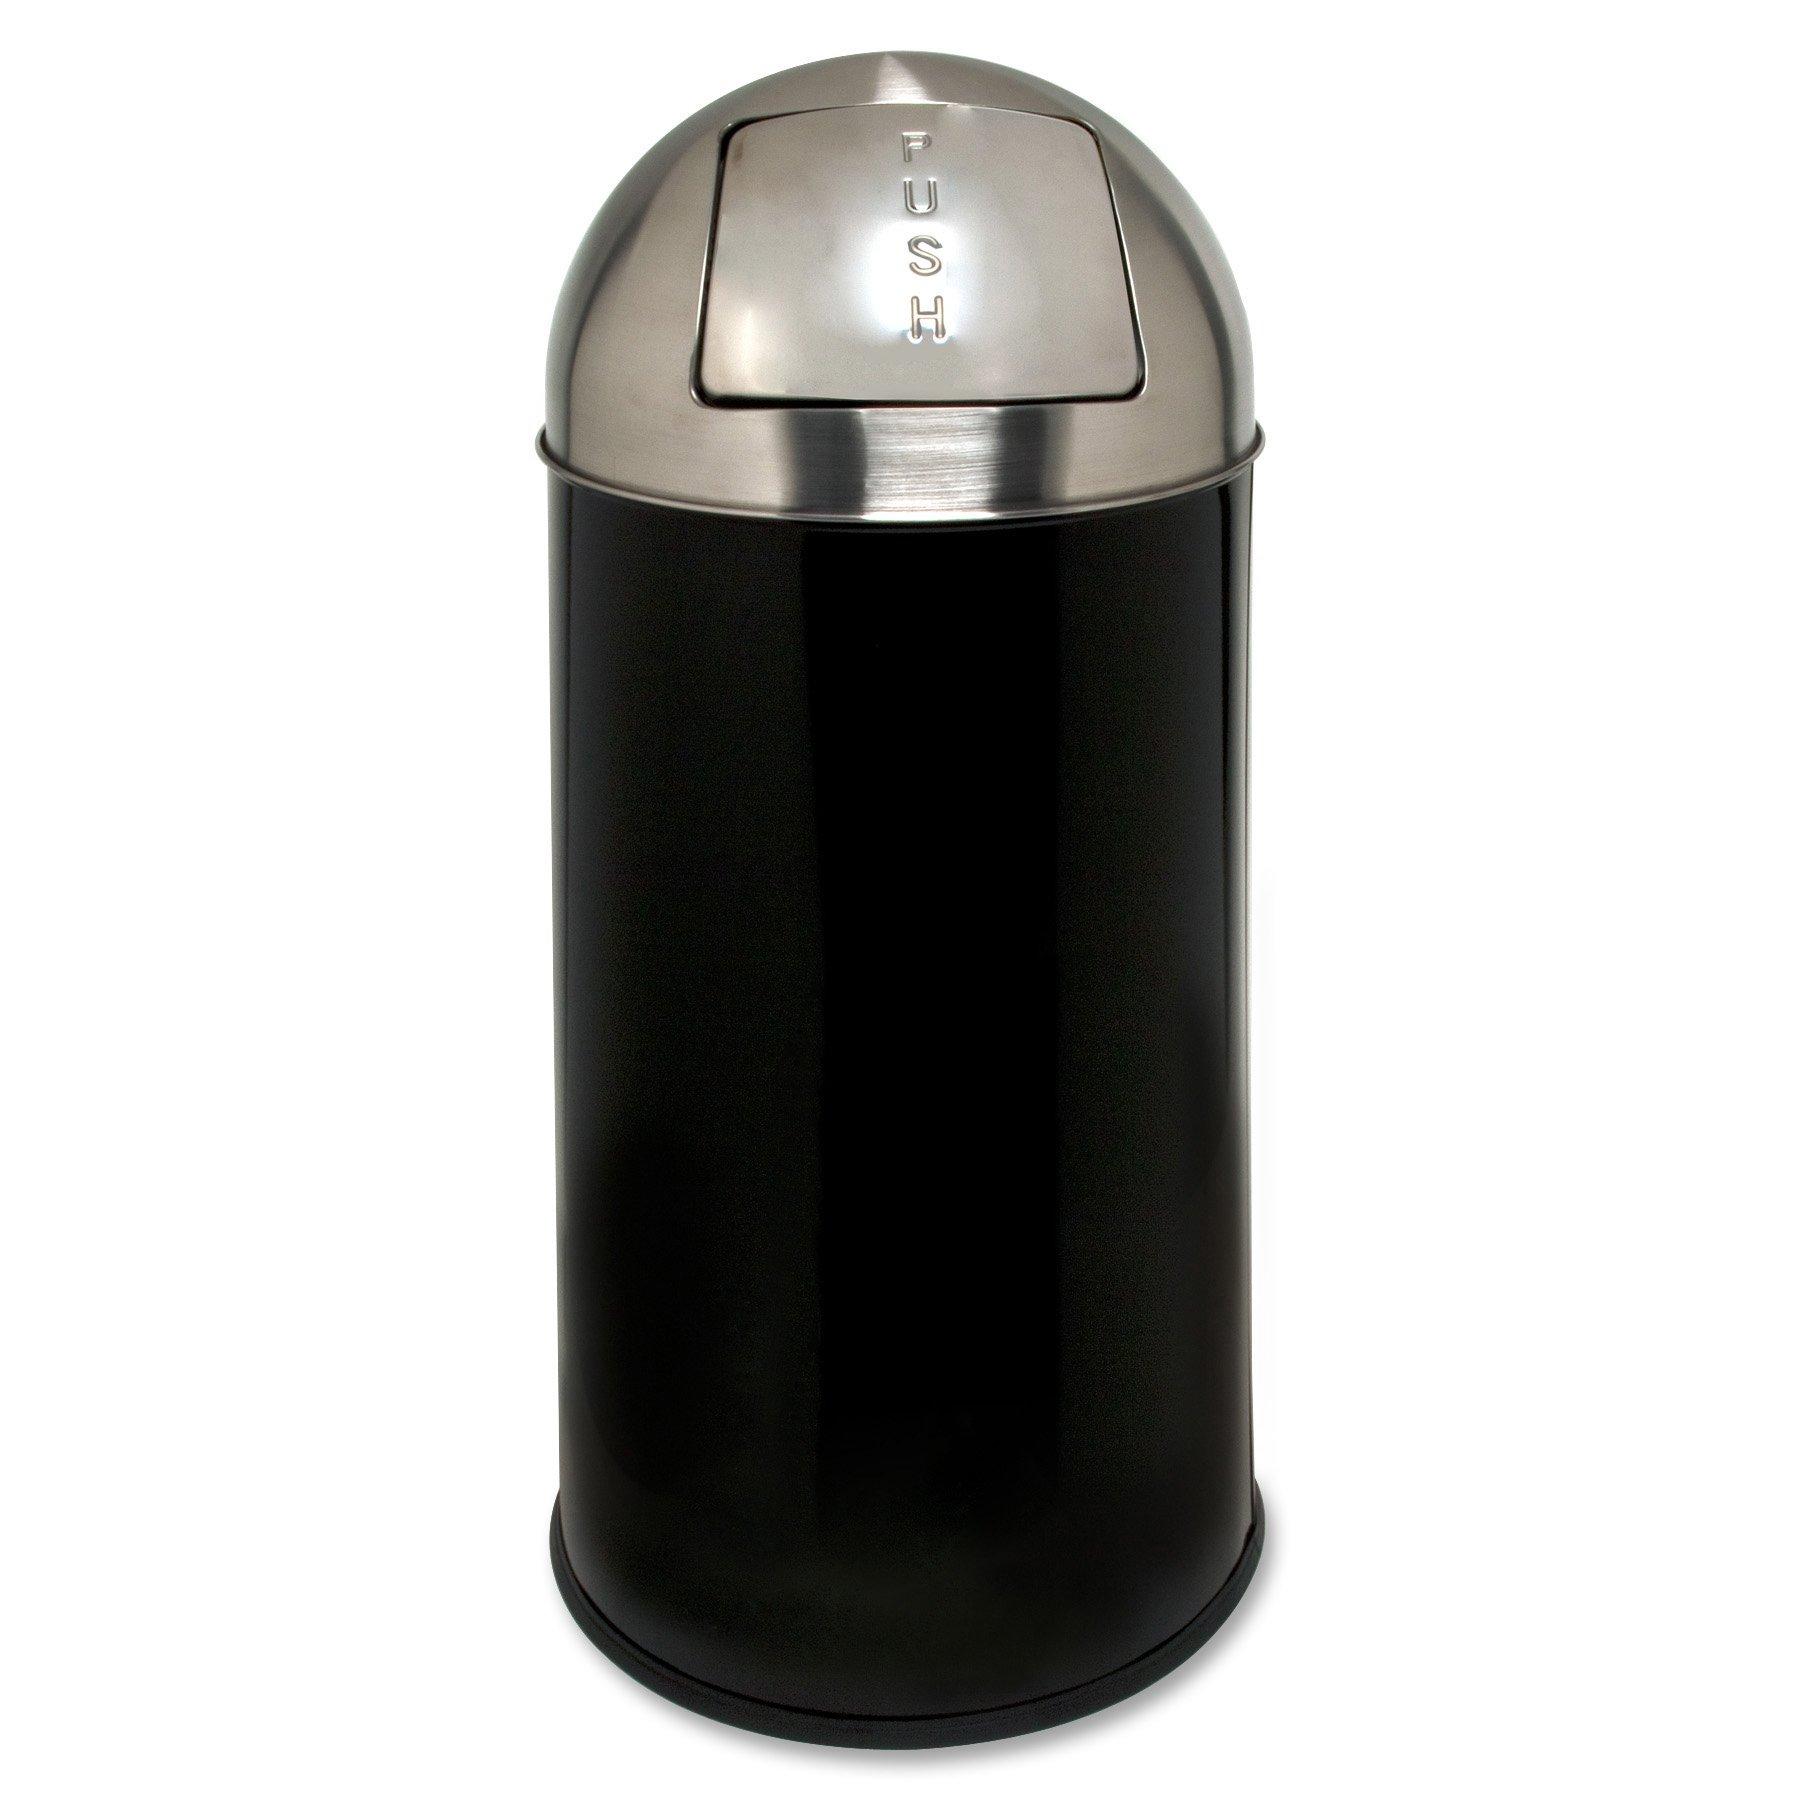 Genuine Joe GJO58886 Classic Round Top Waste Receptacle, 12 gallon Capacity, Black/Silver